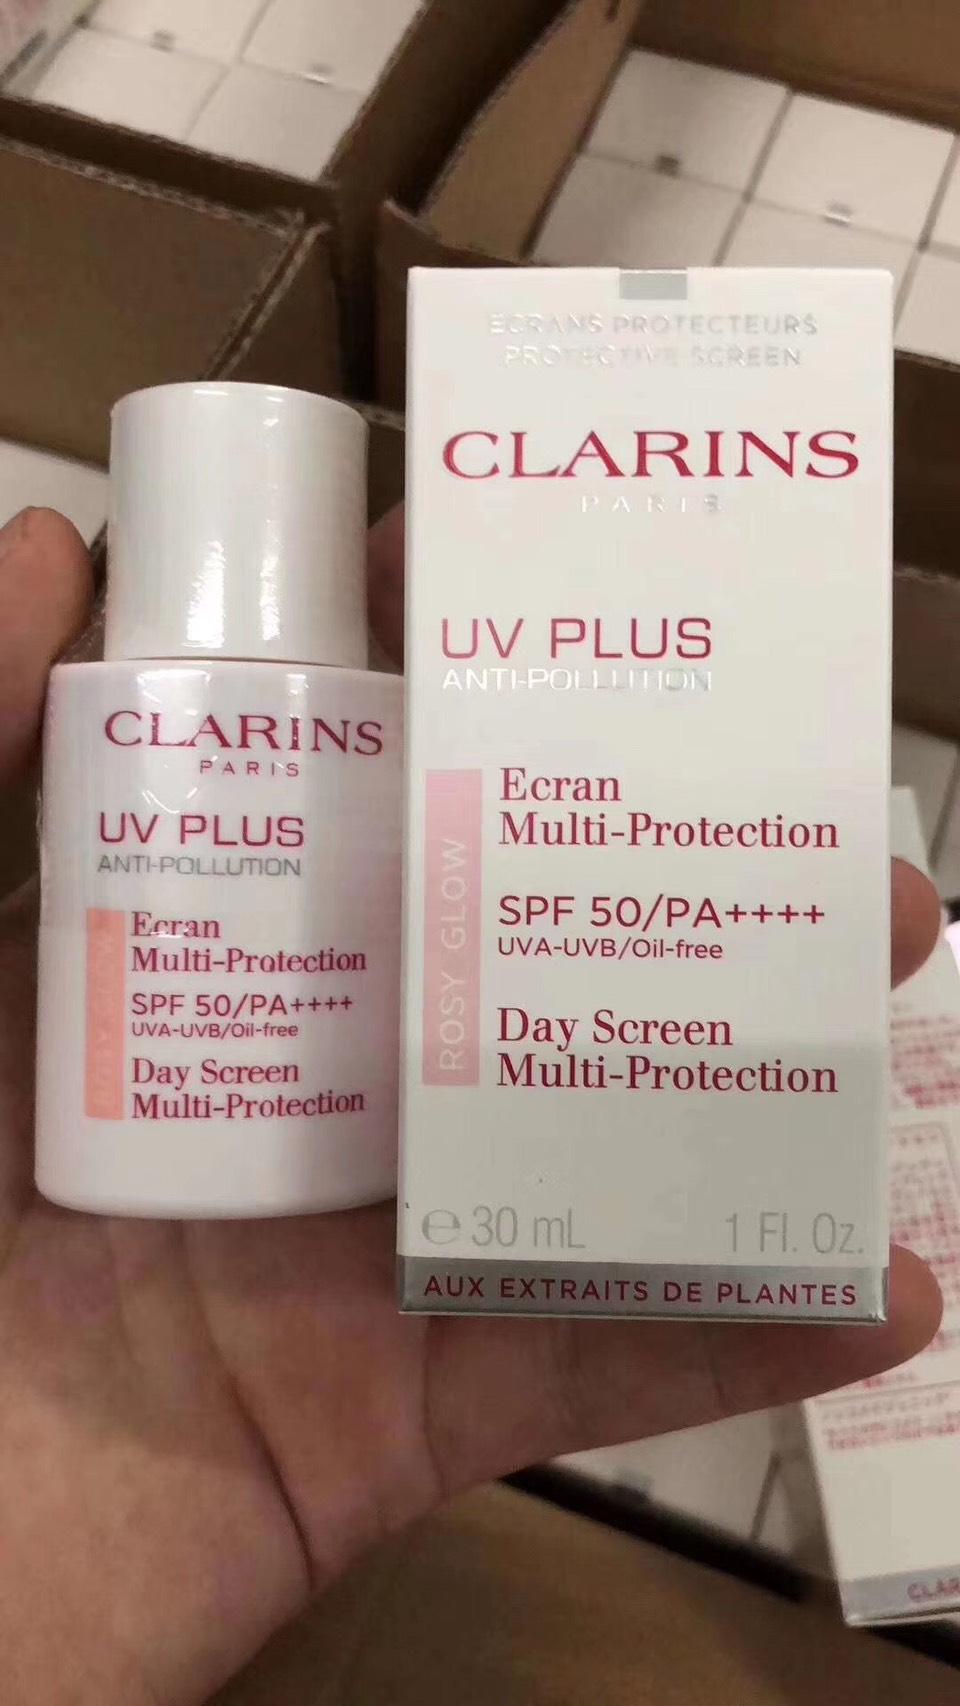 Clarins UV Plus Anti-Pollution Day Screen Multi-Protection SPF 50/PA++++ ขนาด30ml.กันแดดเนื้อเบา